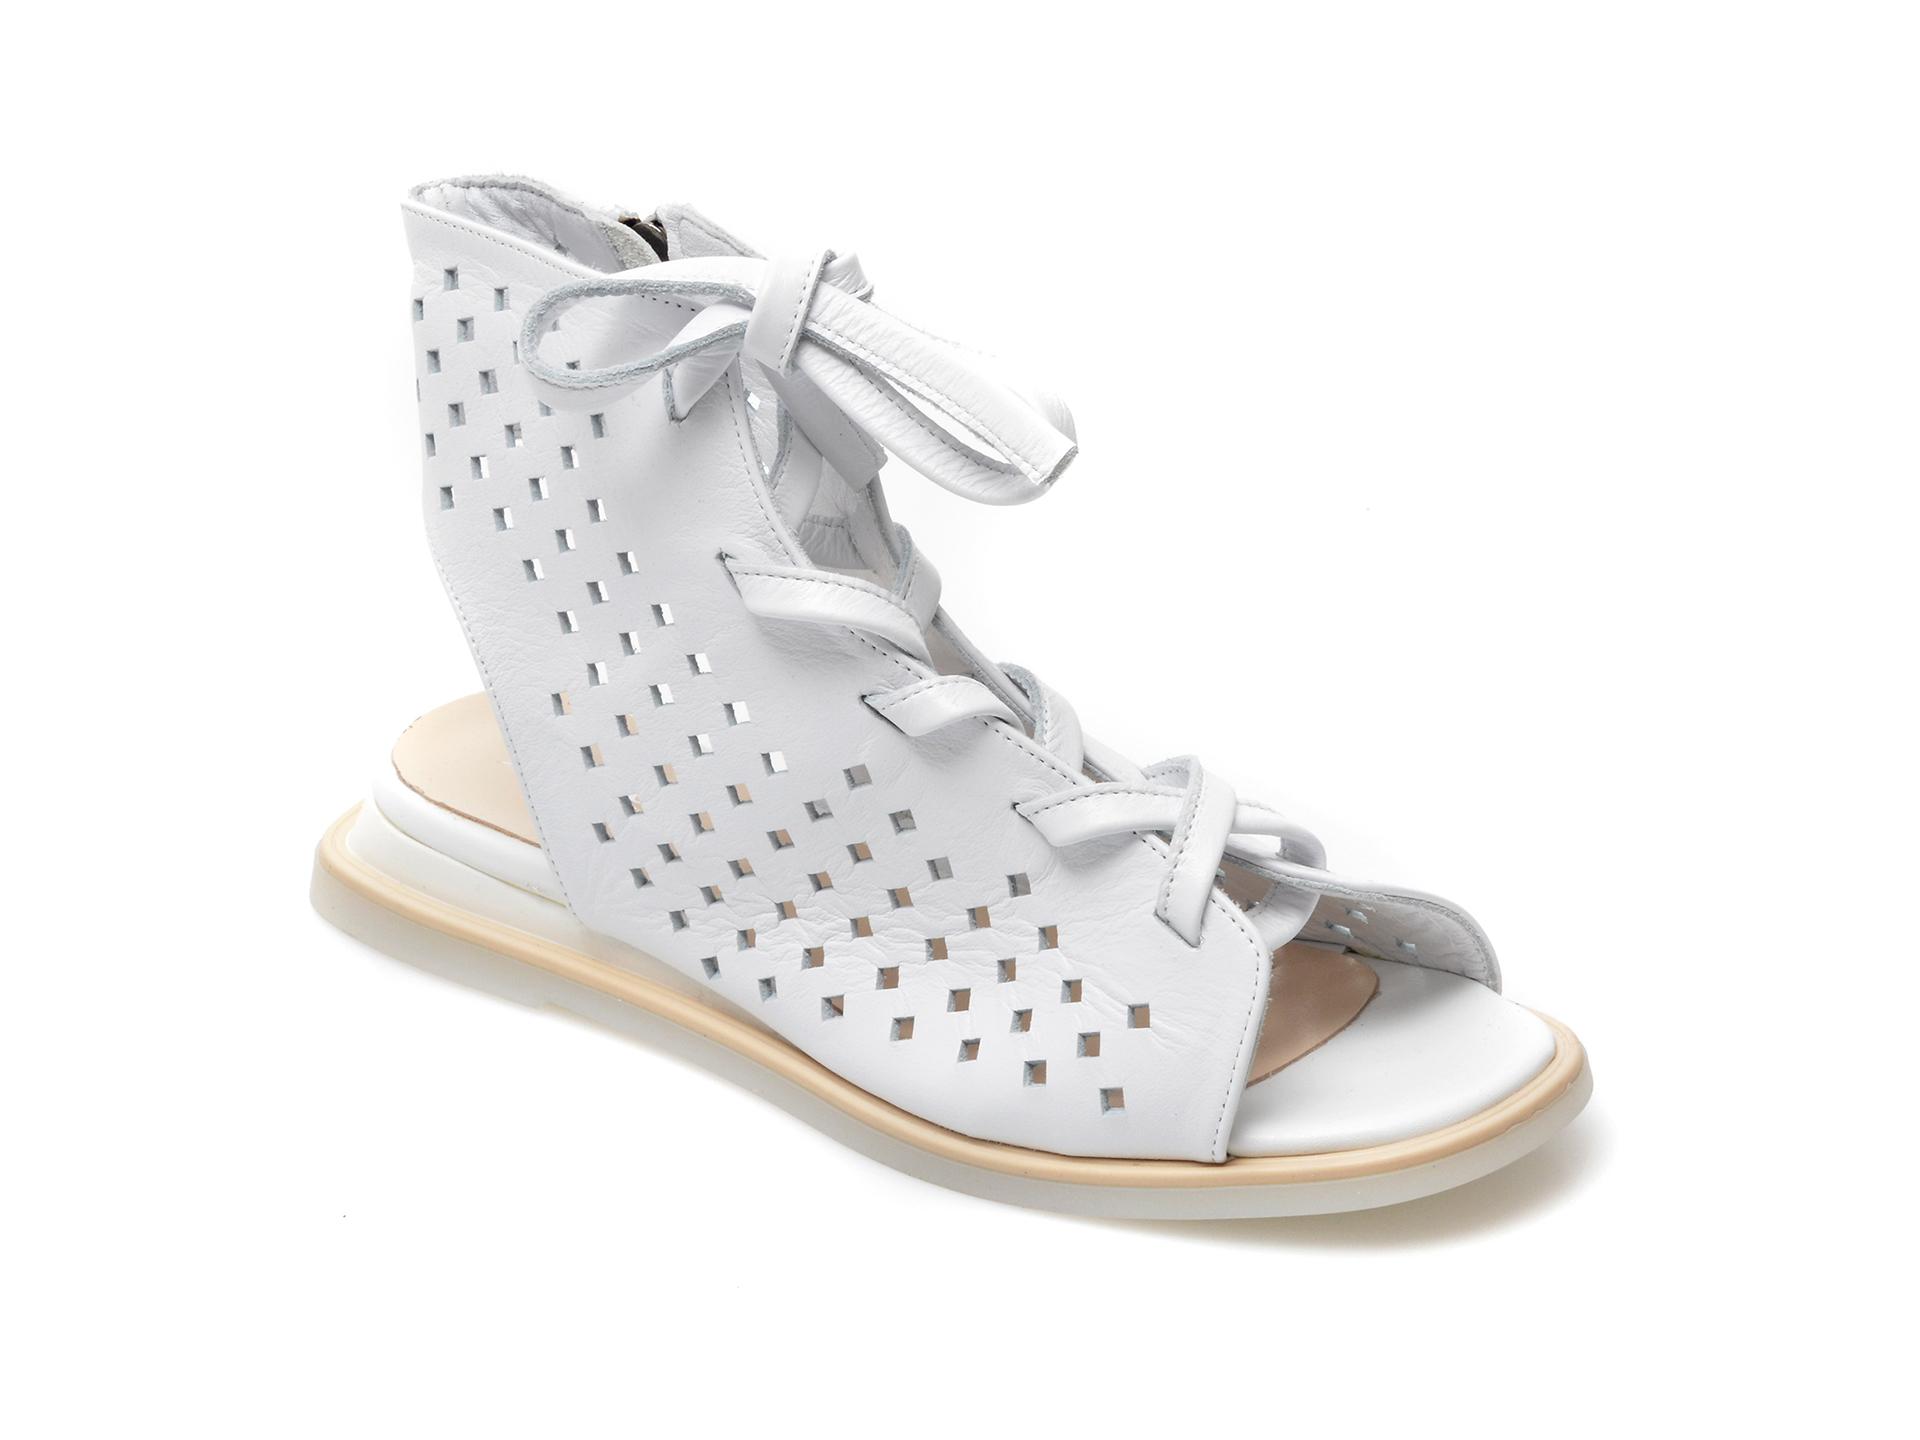 Sandale IMAGE albe, 762032, din piele naturala imagine otter.ro 2021